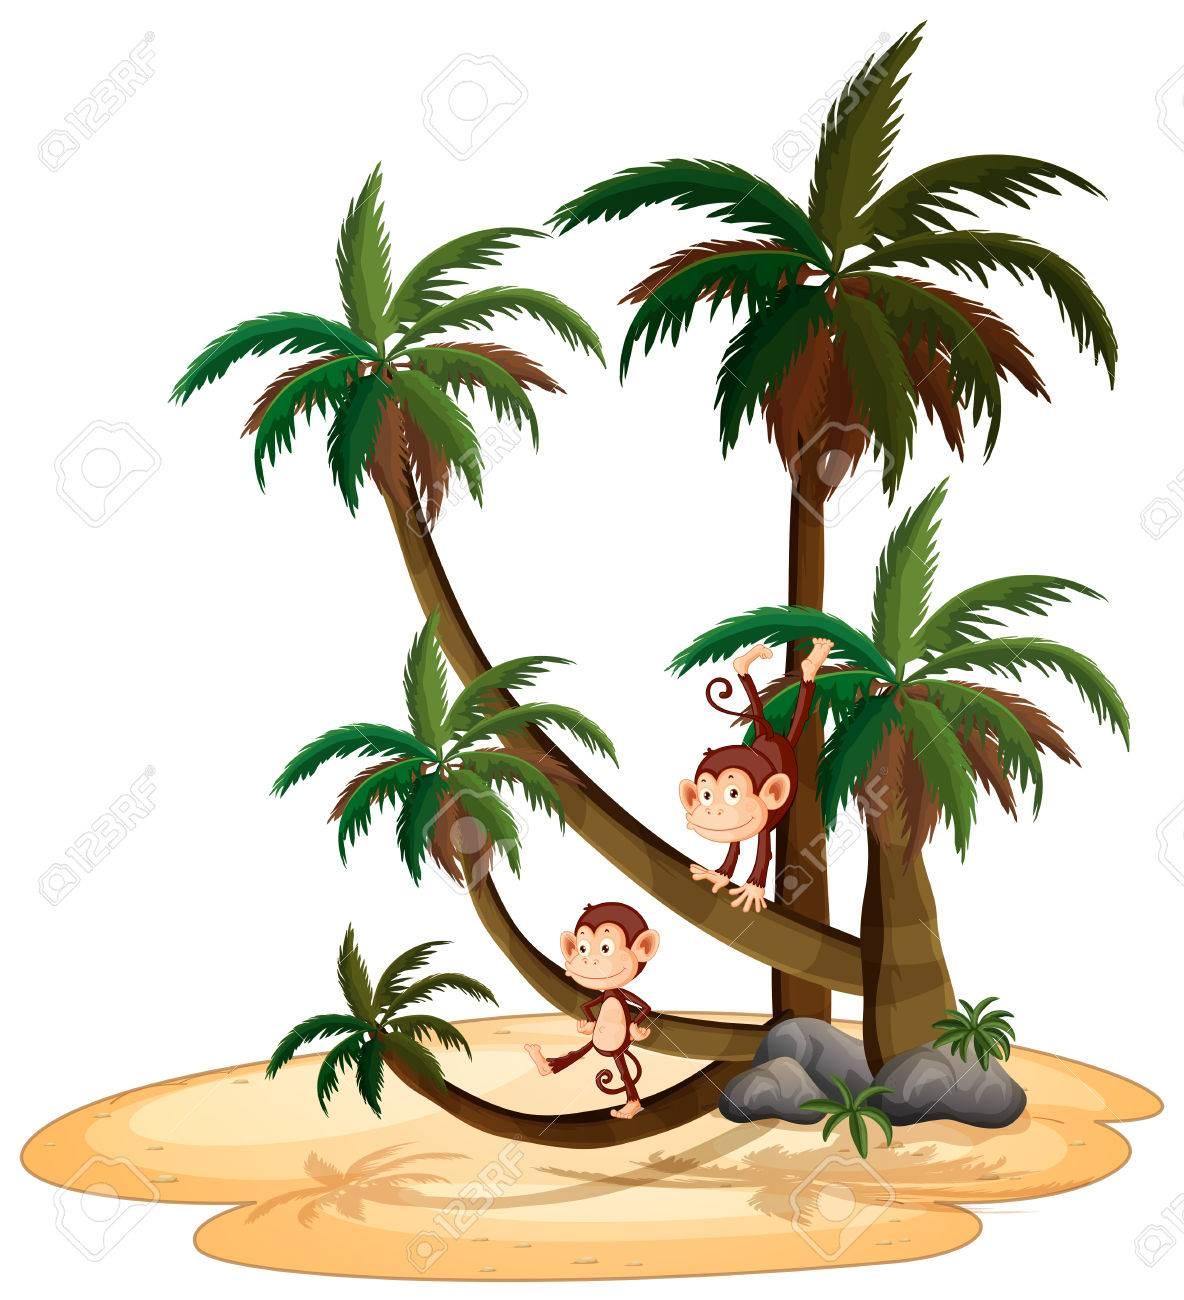 Illustration of monkeys climbing tree.